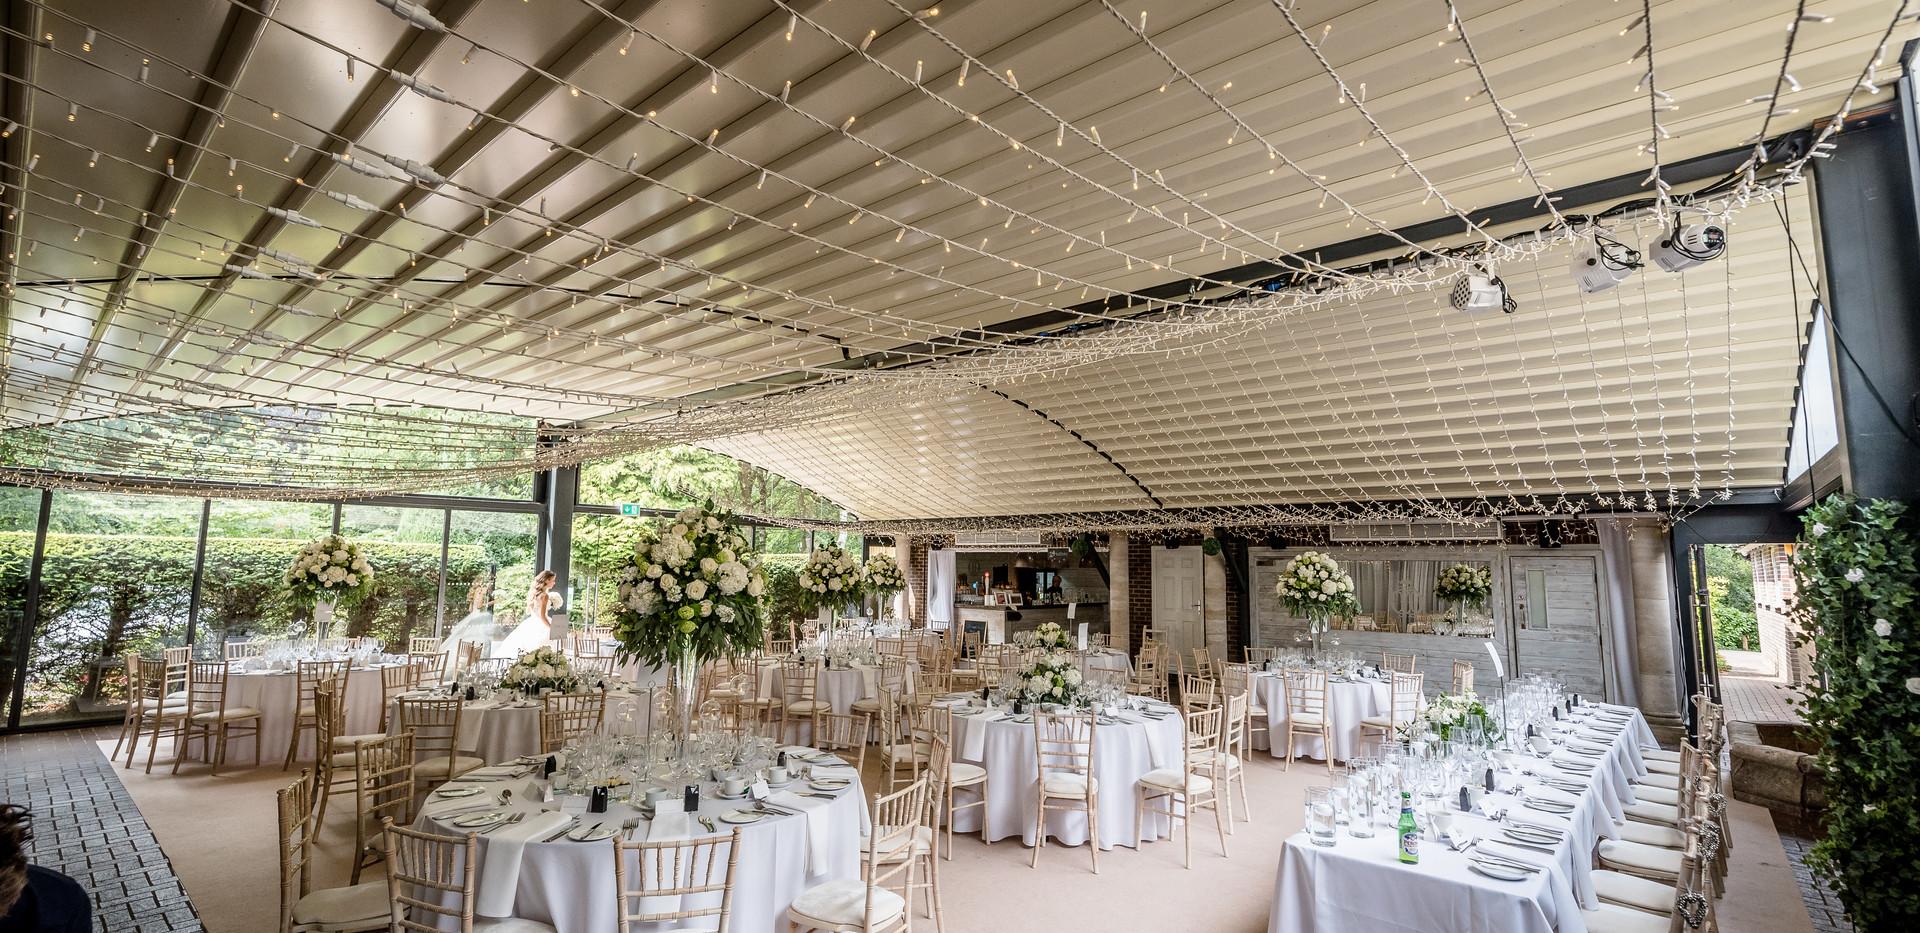 Delamere Manor Wedding Photography___42.